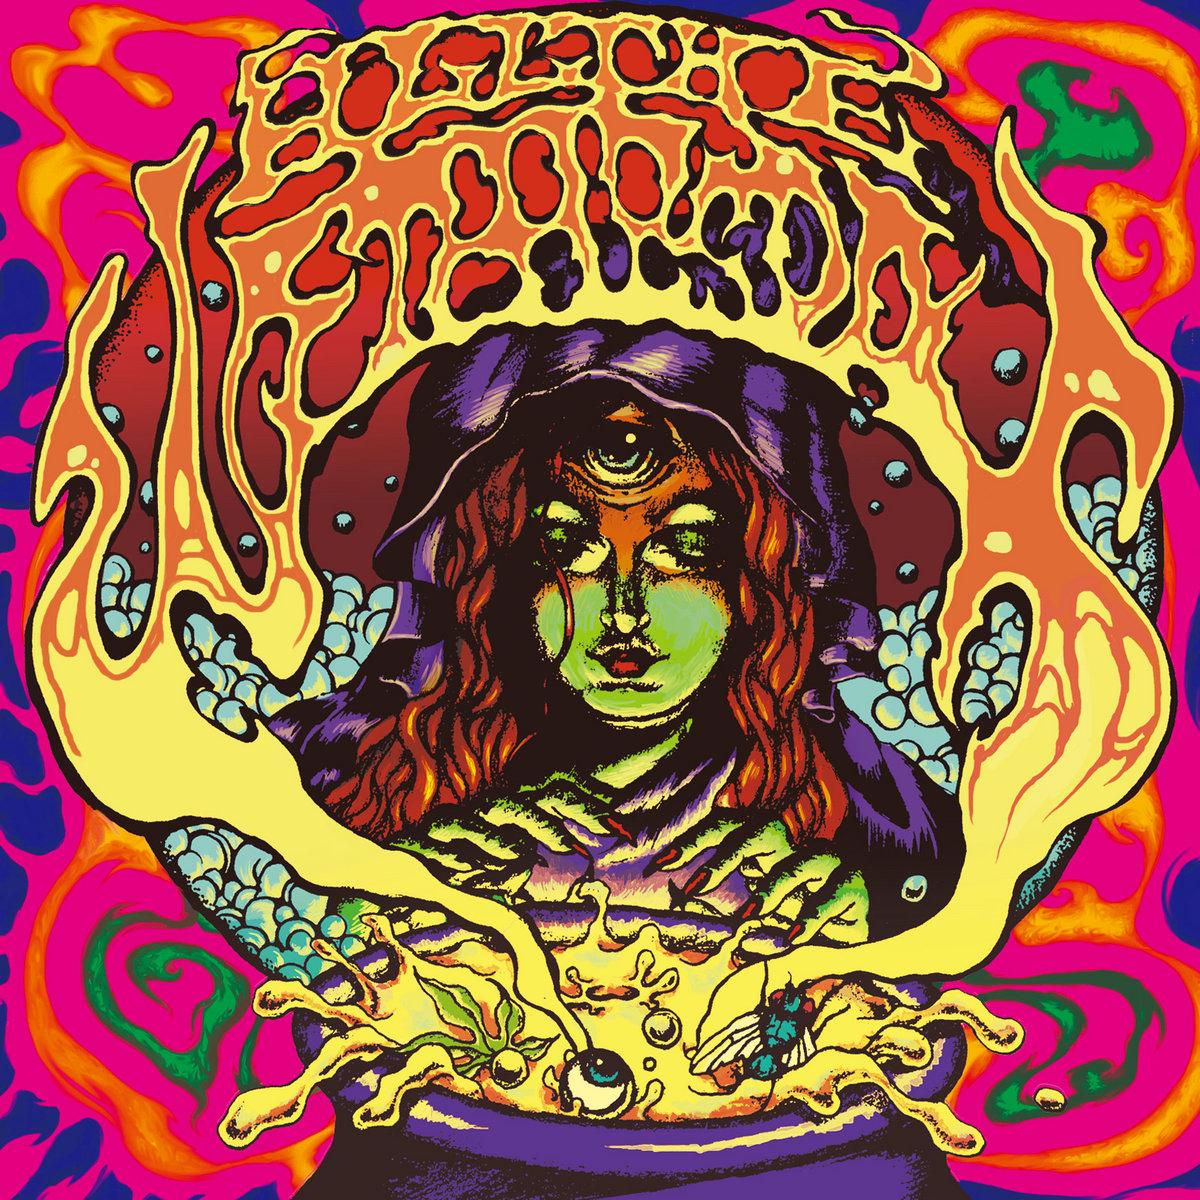 All The Witches' Day Doom/Stoner/Sludge compilation | Bonten